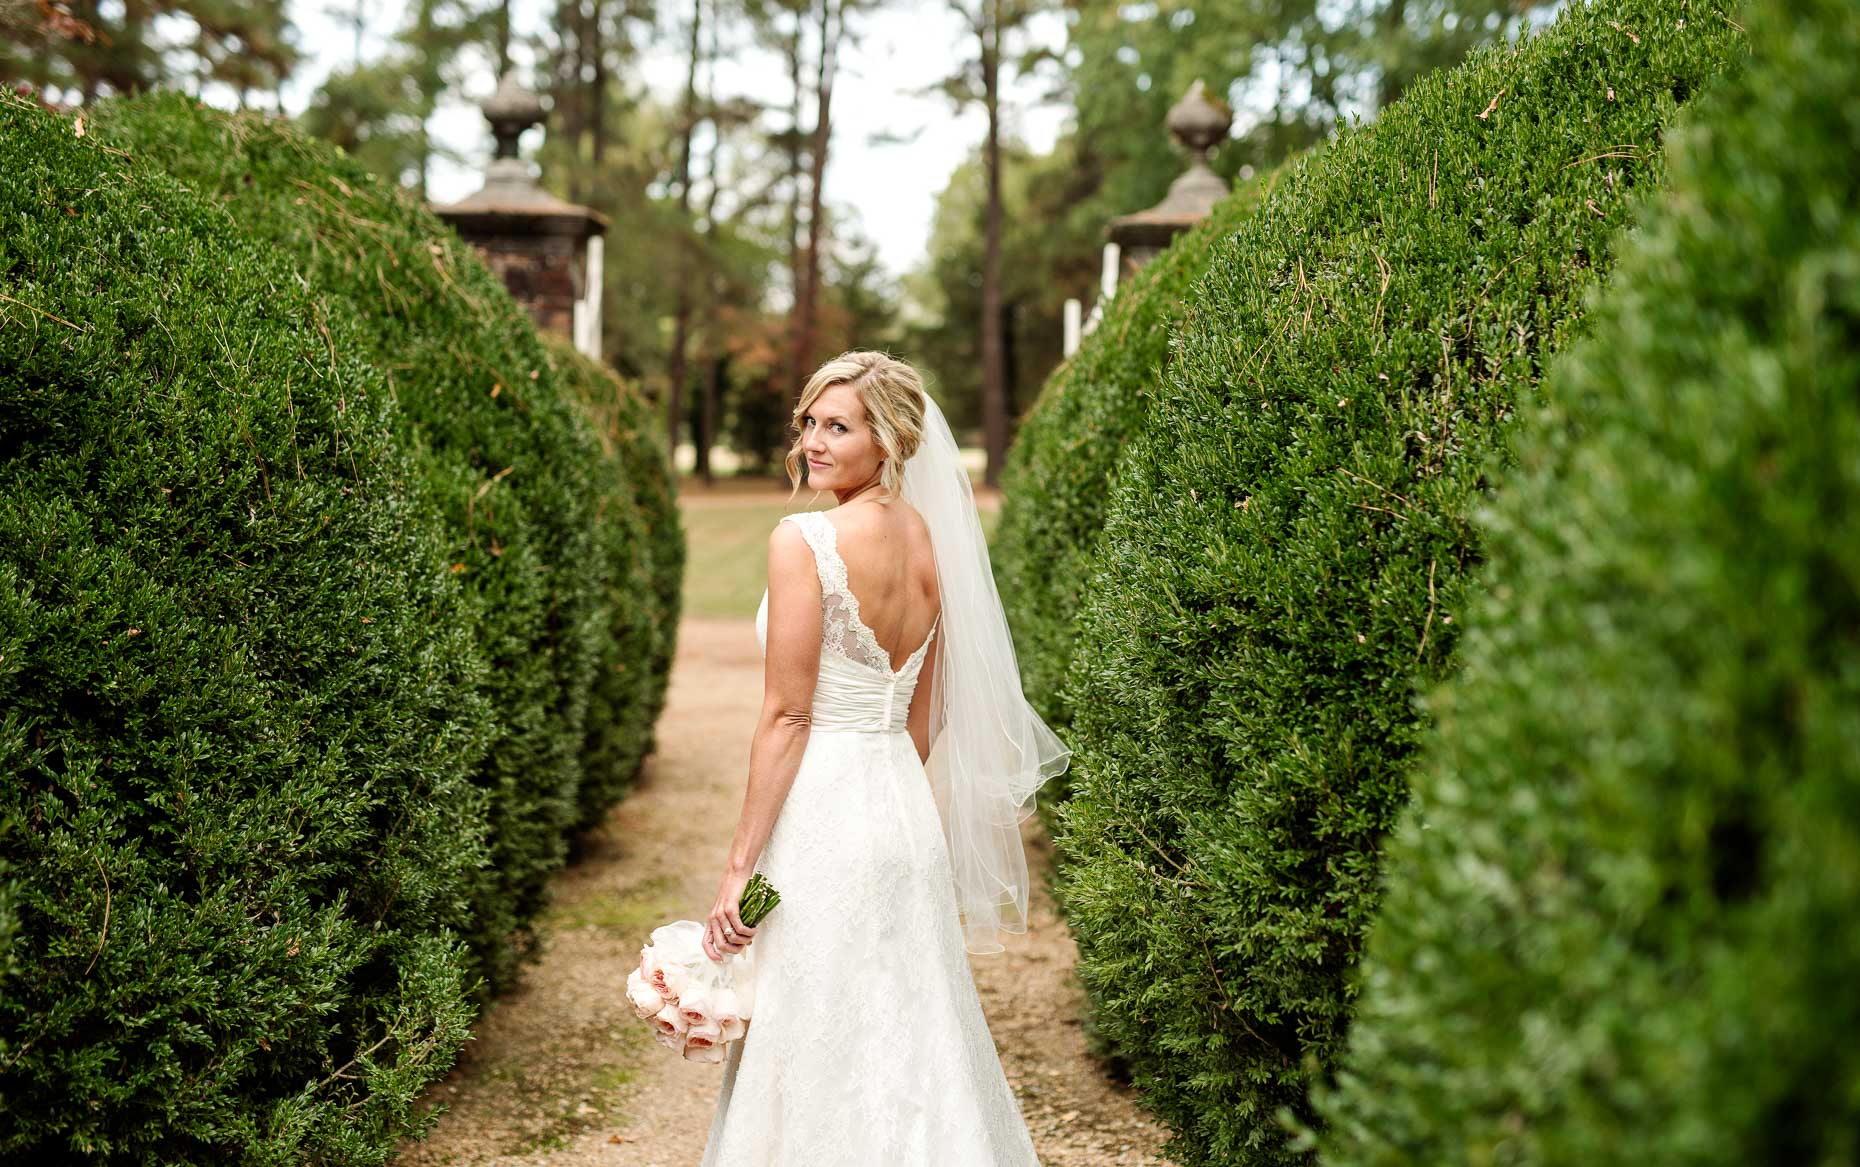 Weddings by Elliott O'Donovan - Washington DC_-9.jpg